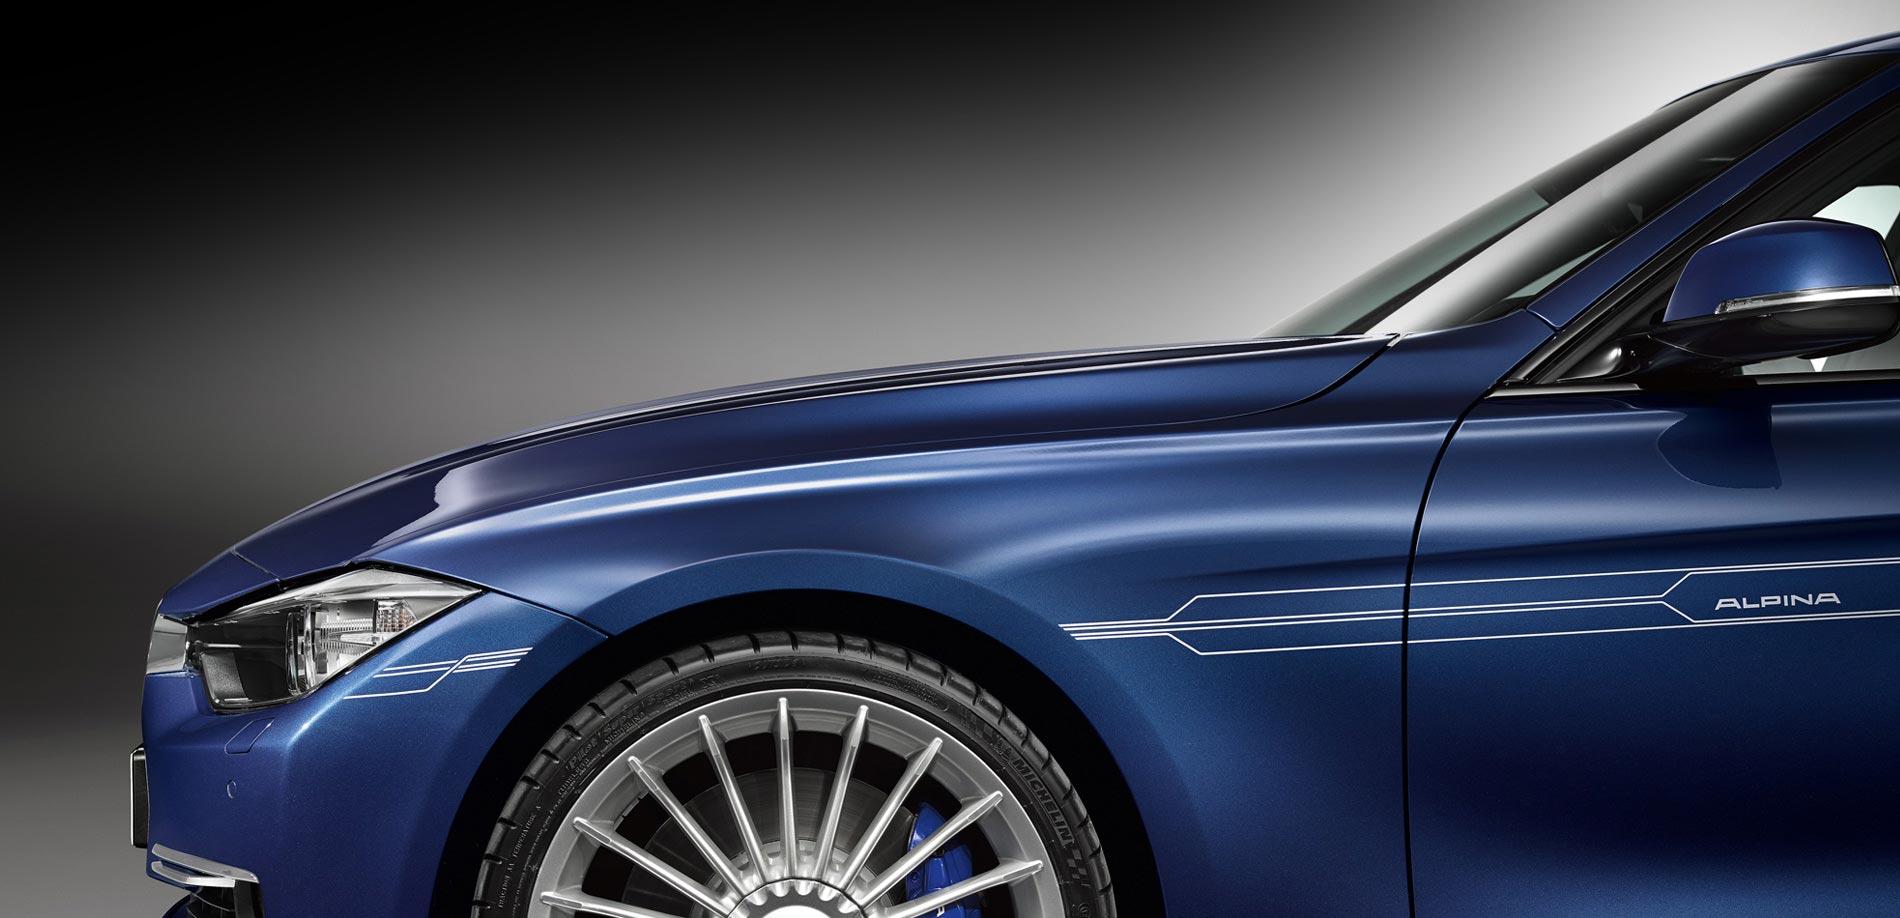 DE: ALPINA Automobiles